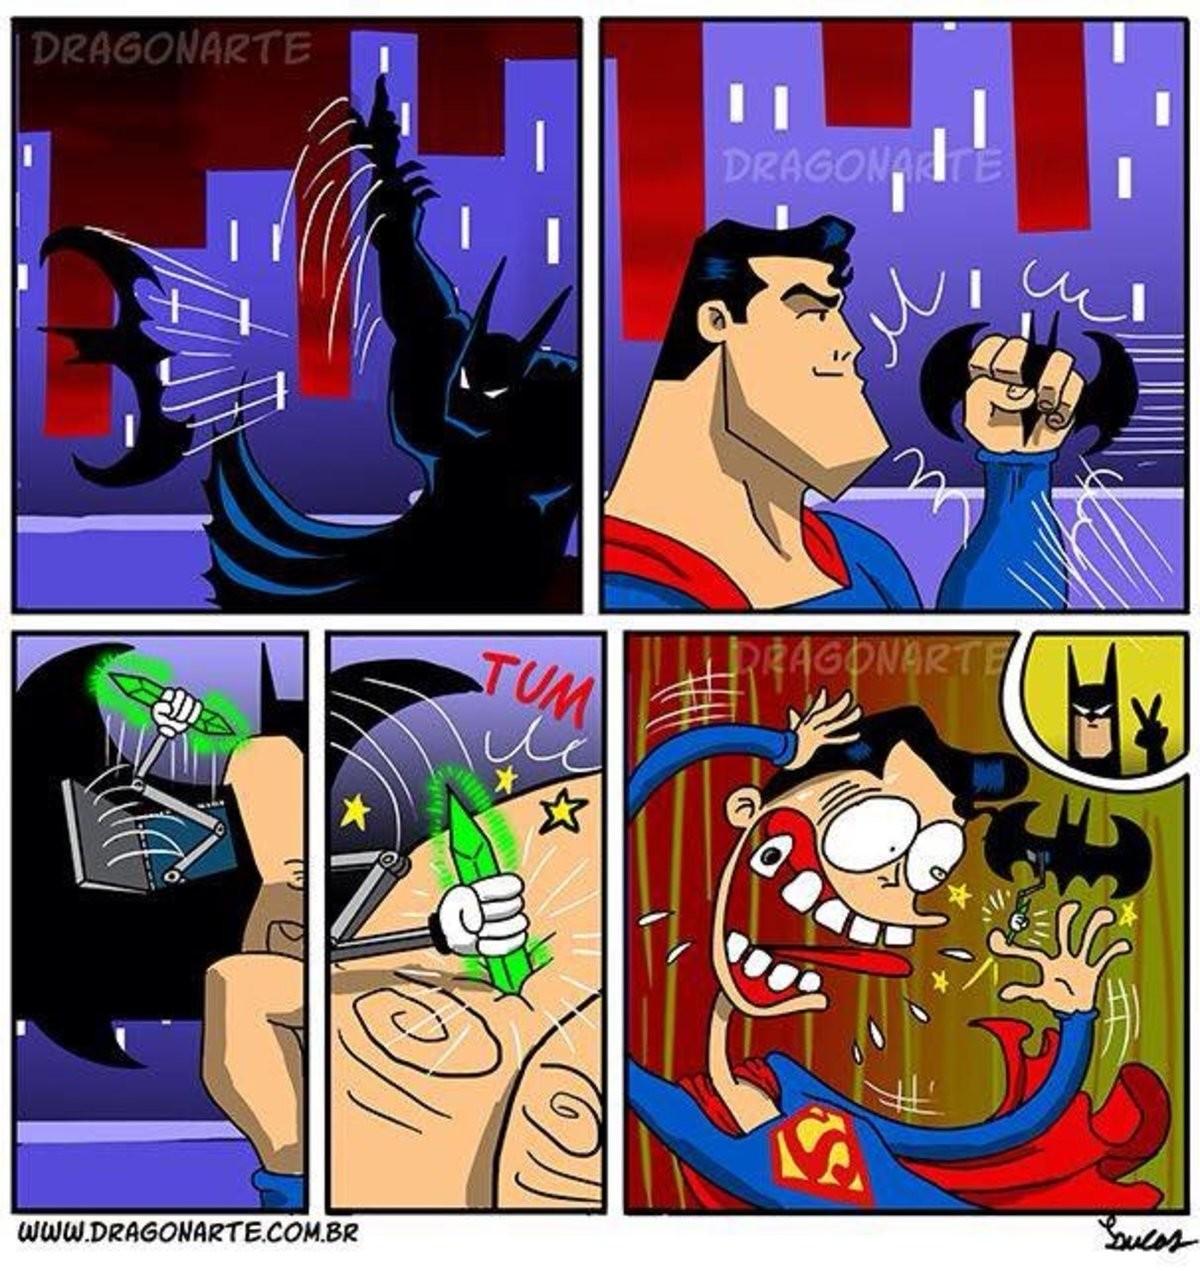 U cheeky kont. .. The ol' spicy batarang